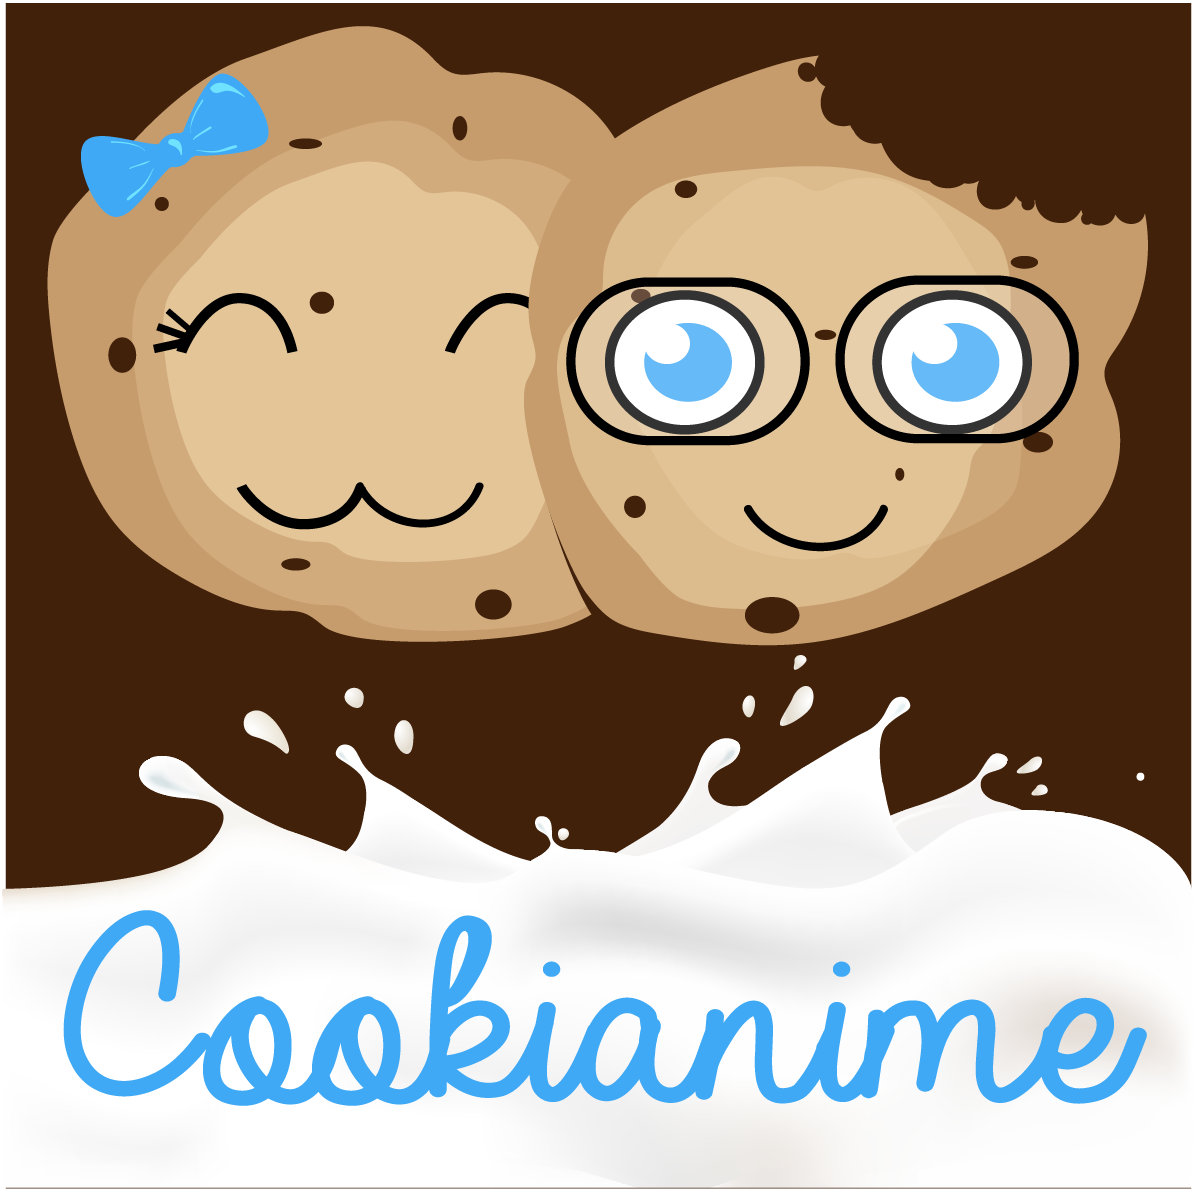 Cookianime